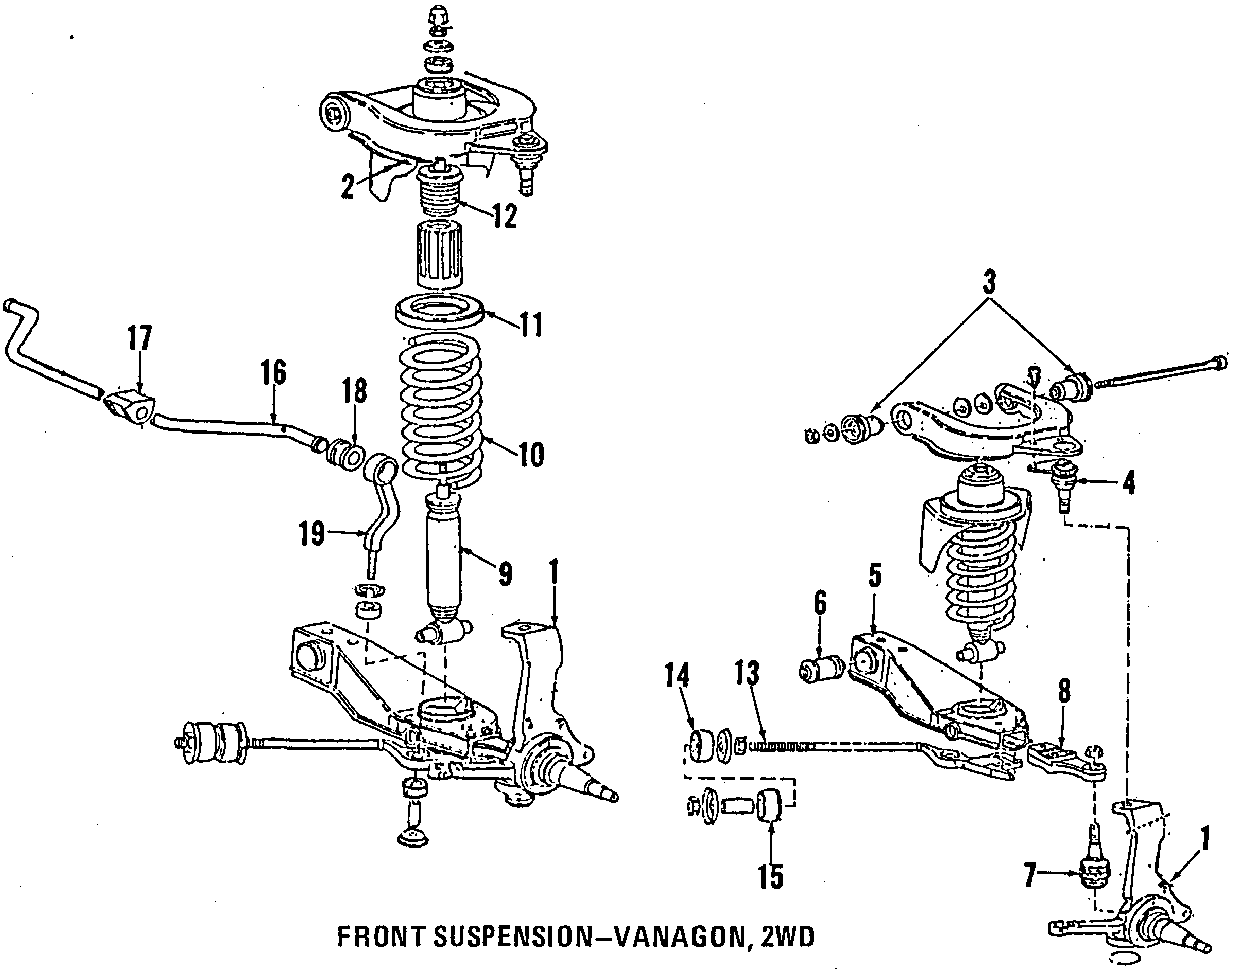 vanagon front suspension diagram